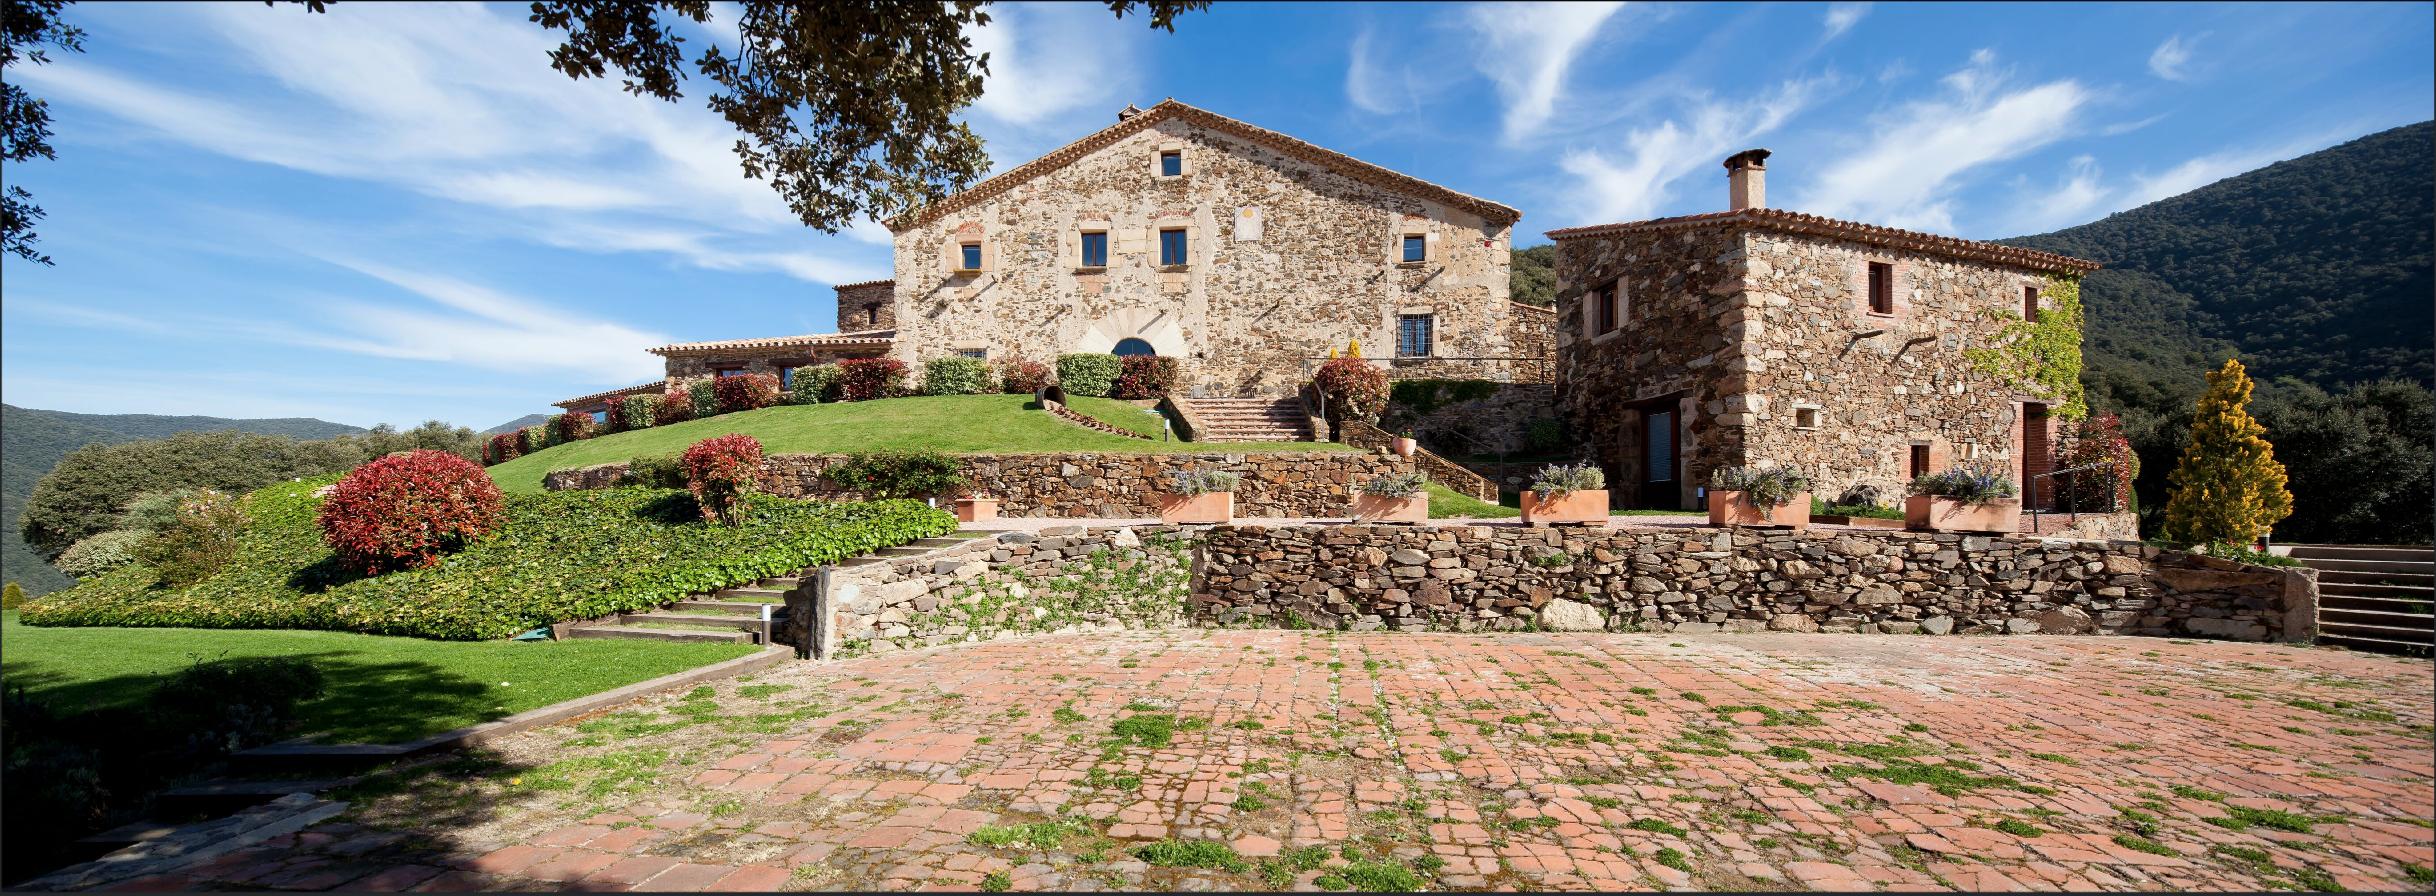 Can Cuch, une ancienne ferme catalane devenue hôtel de charme. © Can Cuch